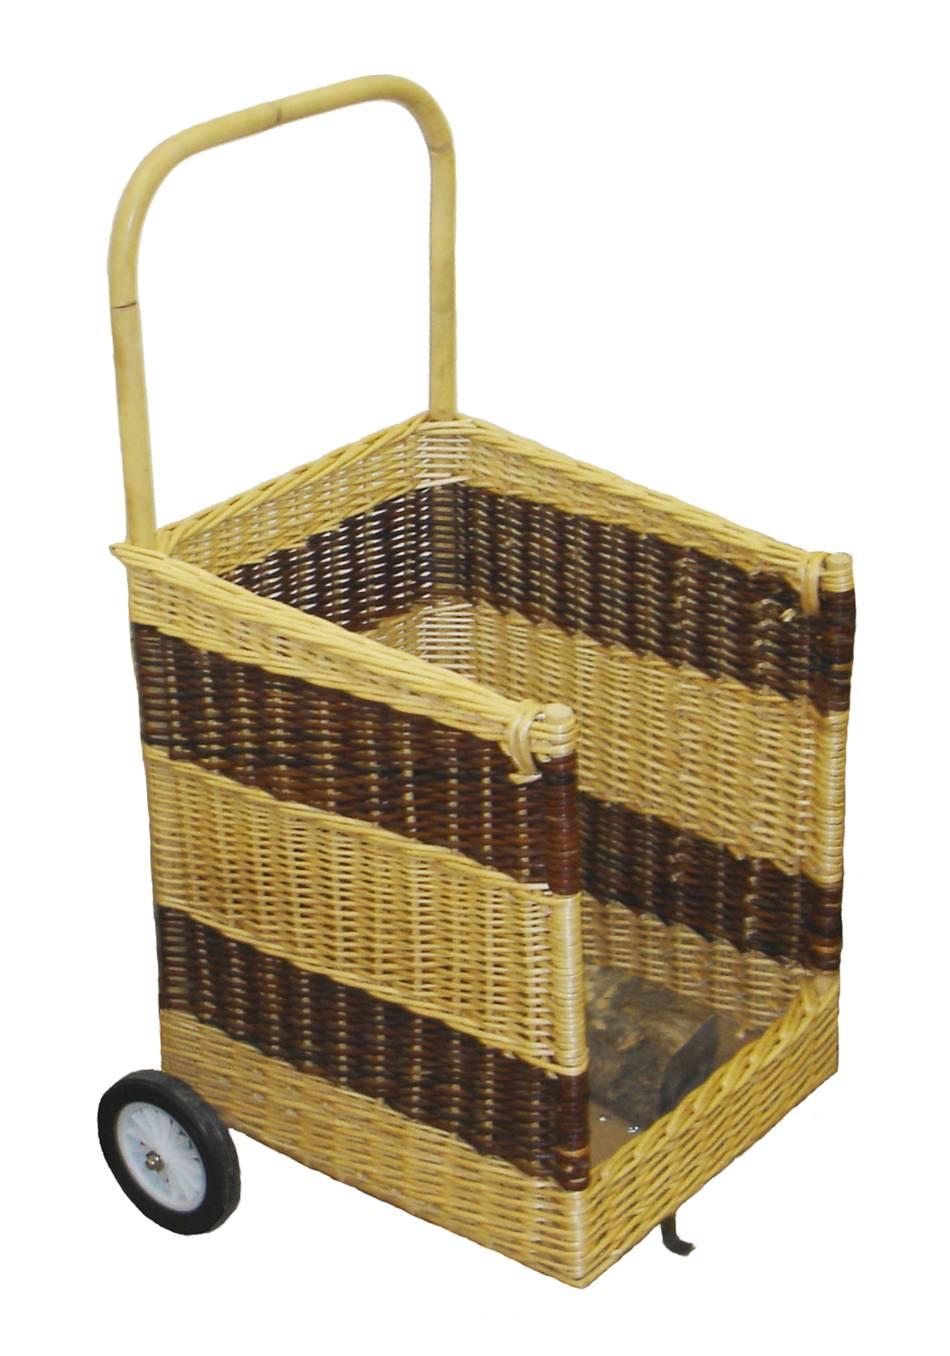 chariot bois en osier 2 tons carr ouvert fabrication. Black Bedroom Furniture Sets. Home Design Ideas